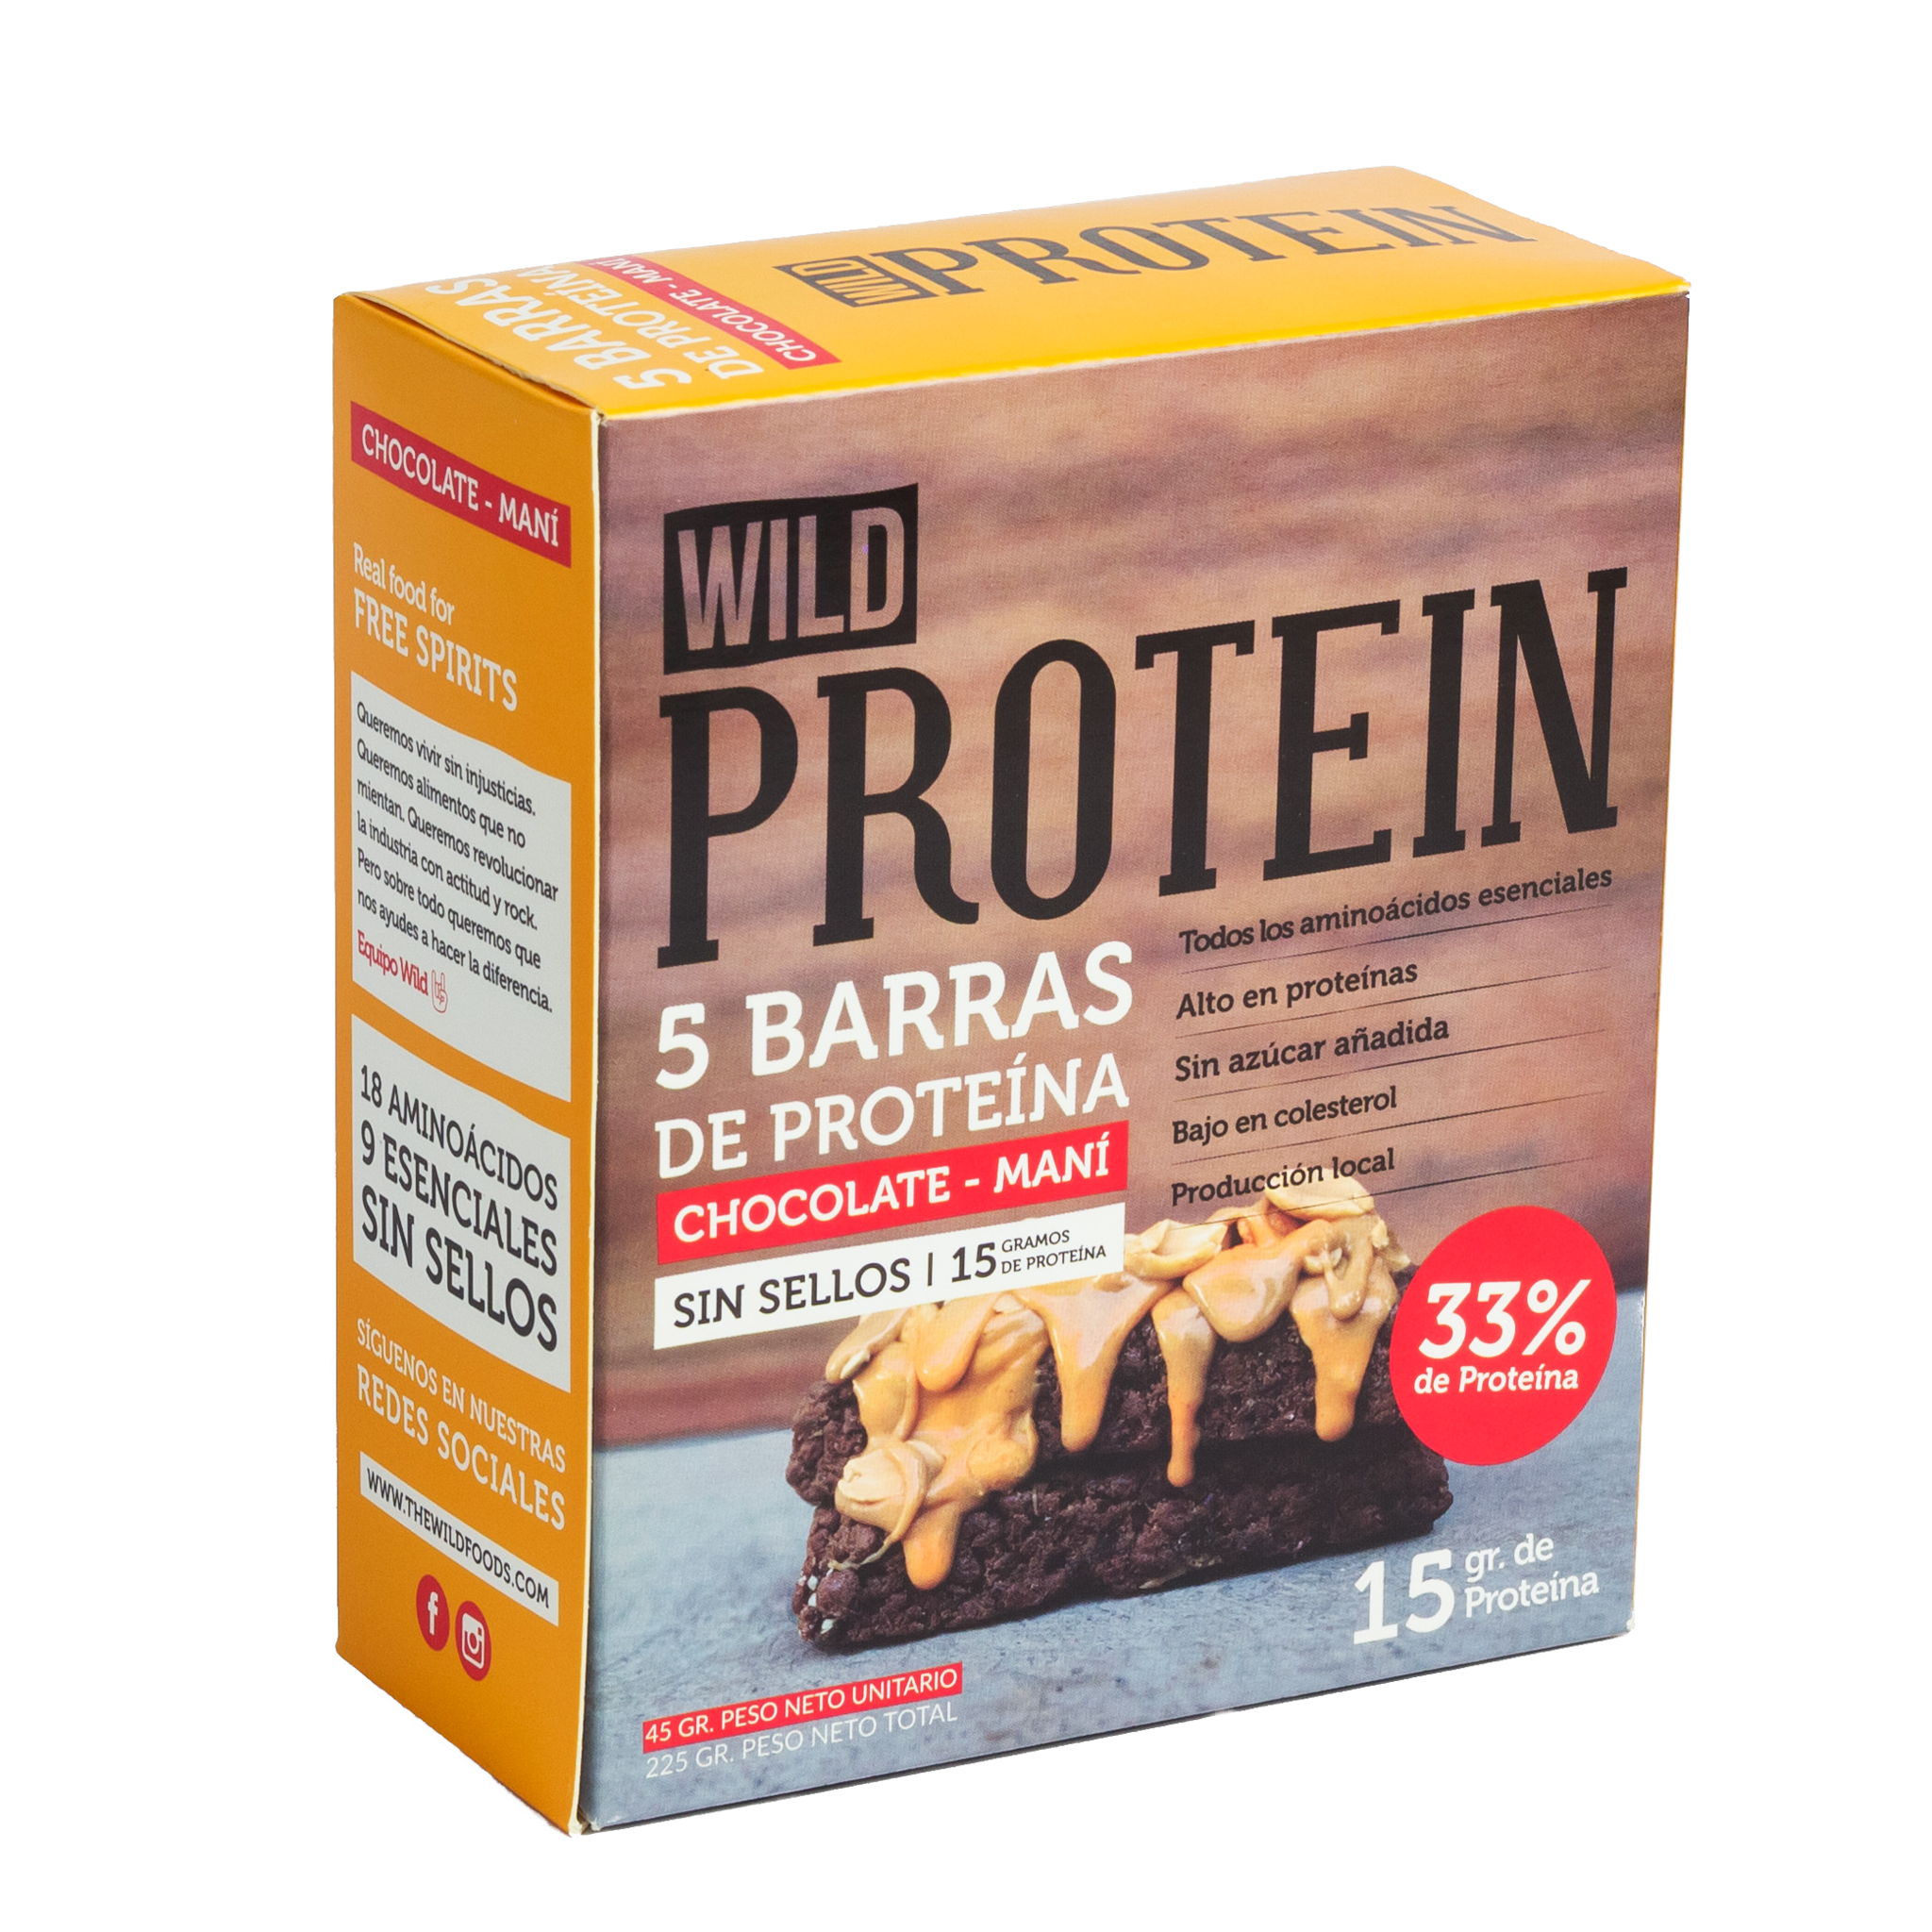 Barra Proteica Wild Protein Chocolate Maní 5 Unidades